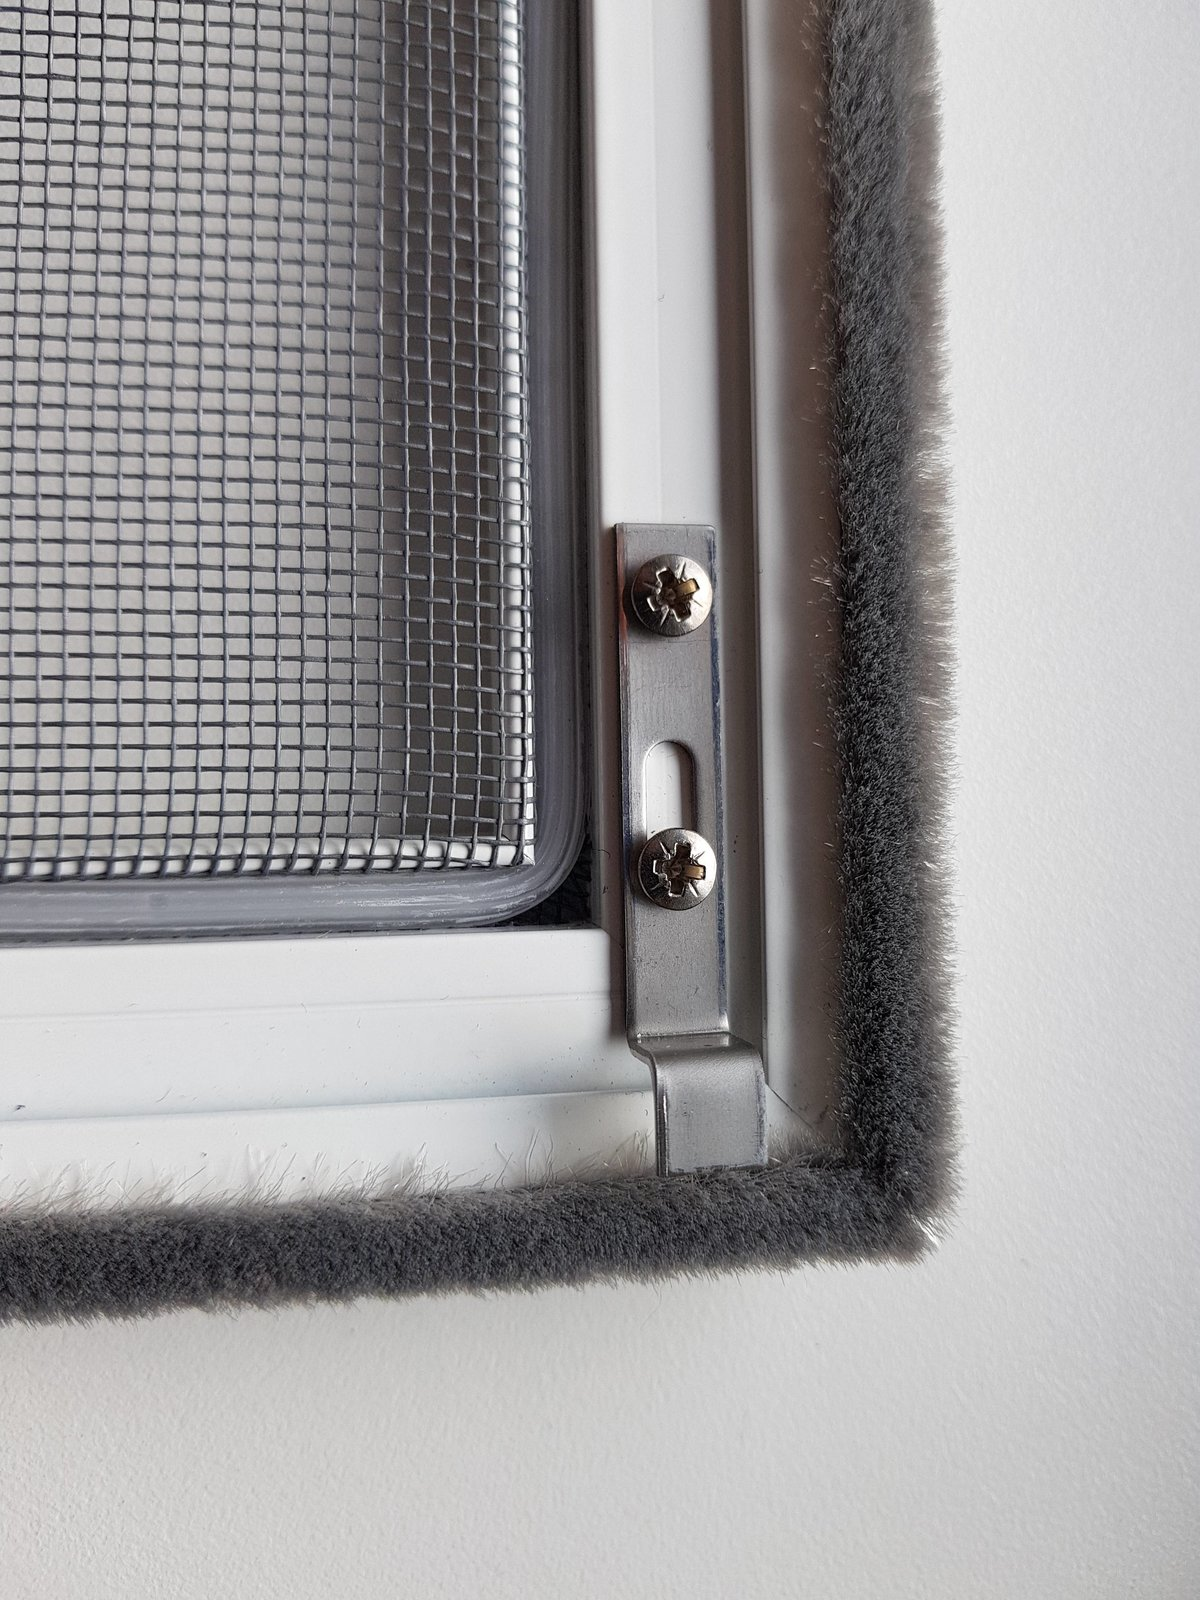 insektenschutzgitter f r fenster ps al k system. Black Bedroom Furniture Sets. Home Design Ideas